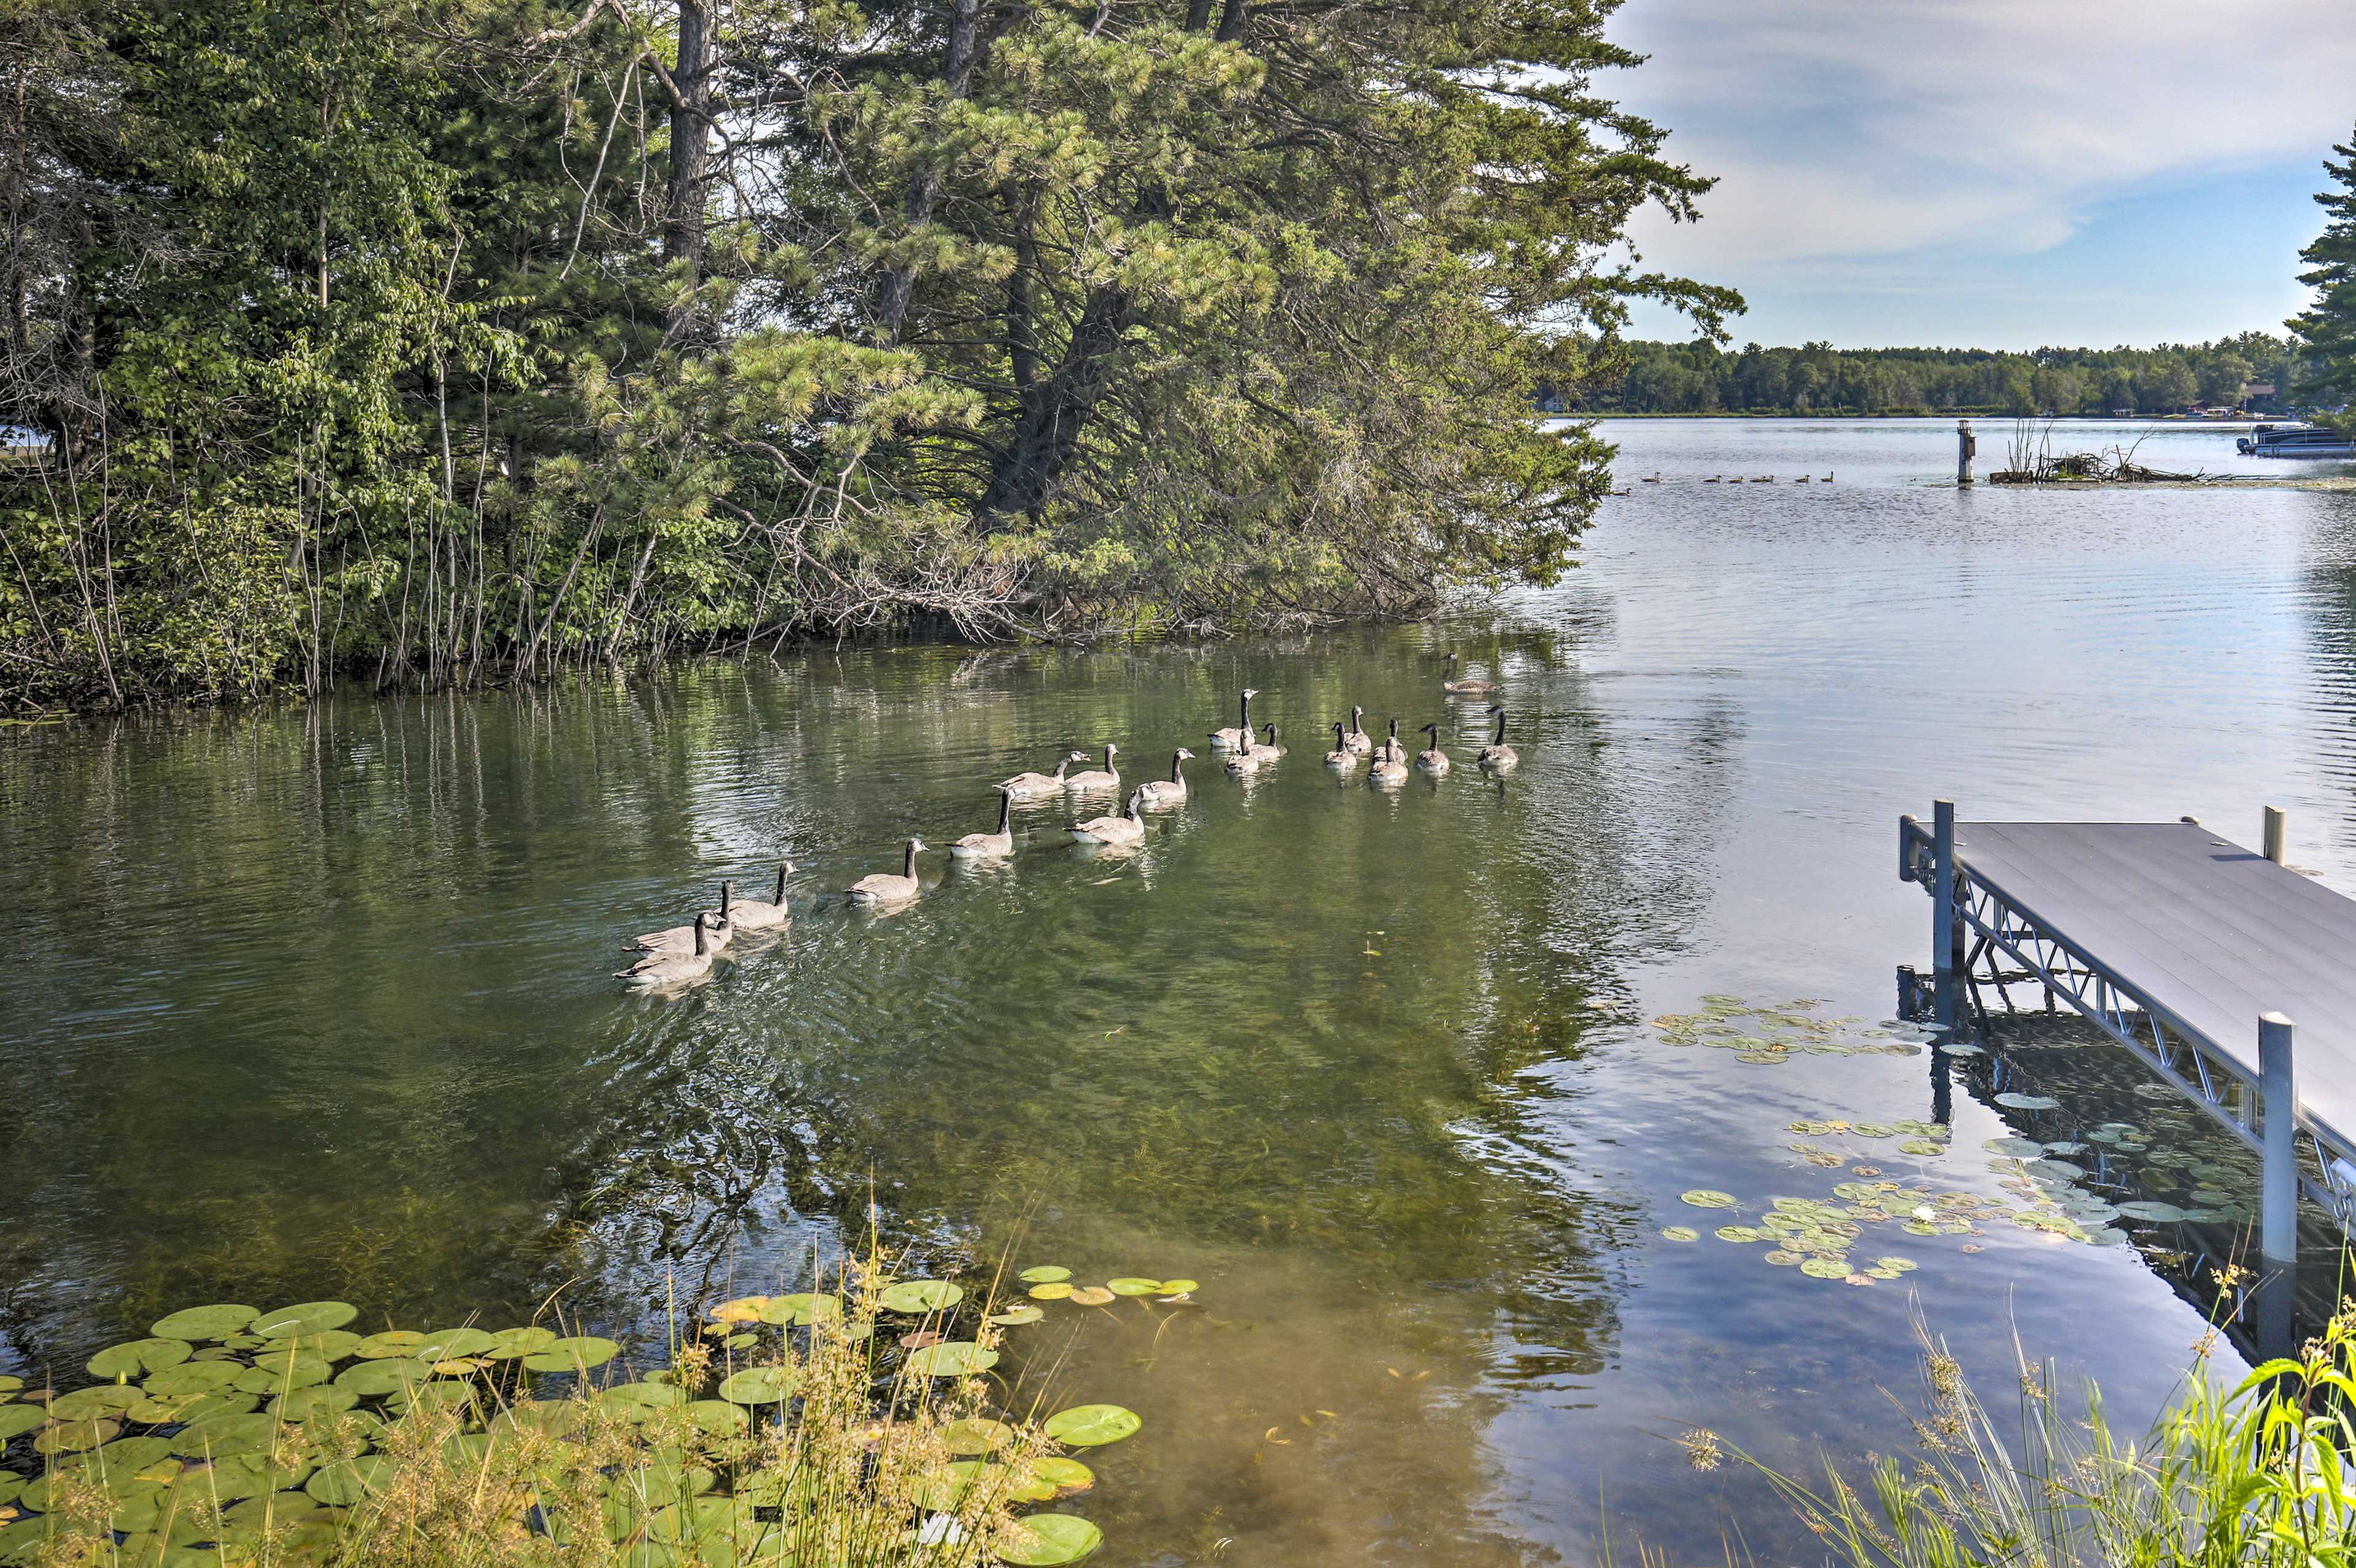 Watch the ducks float by.